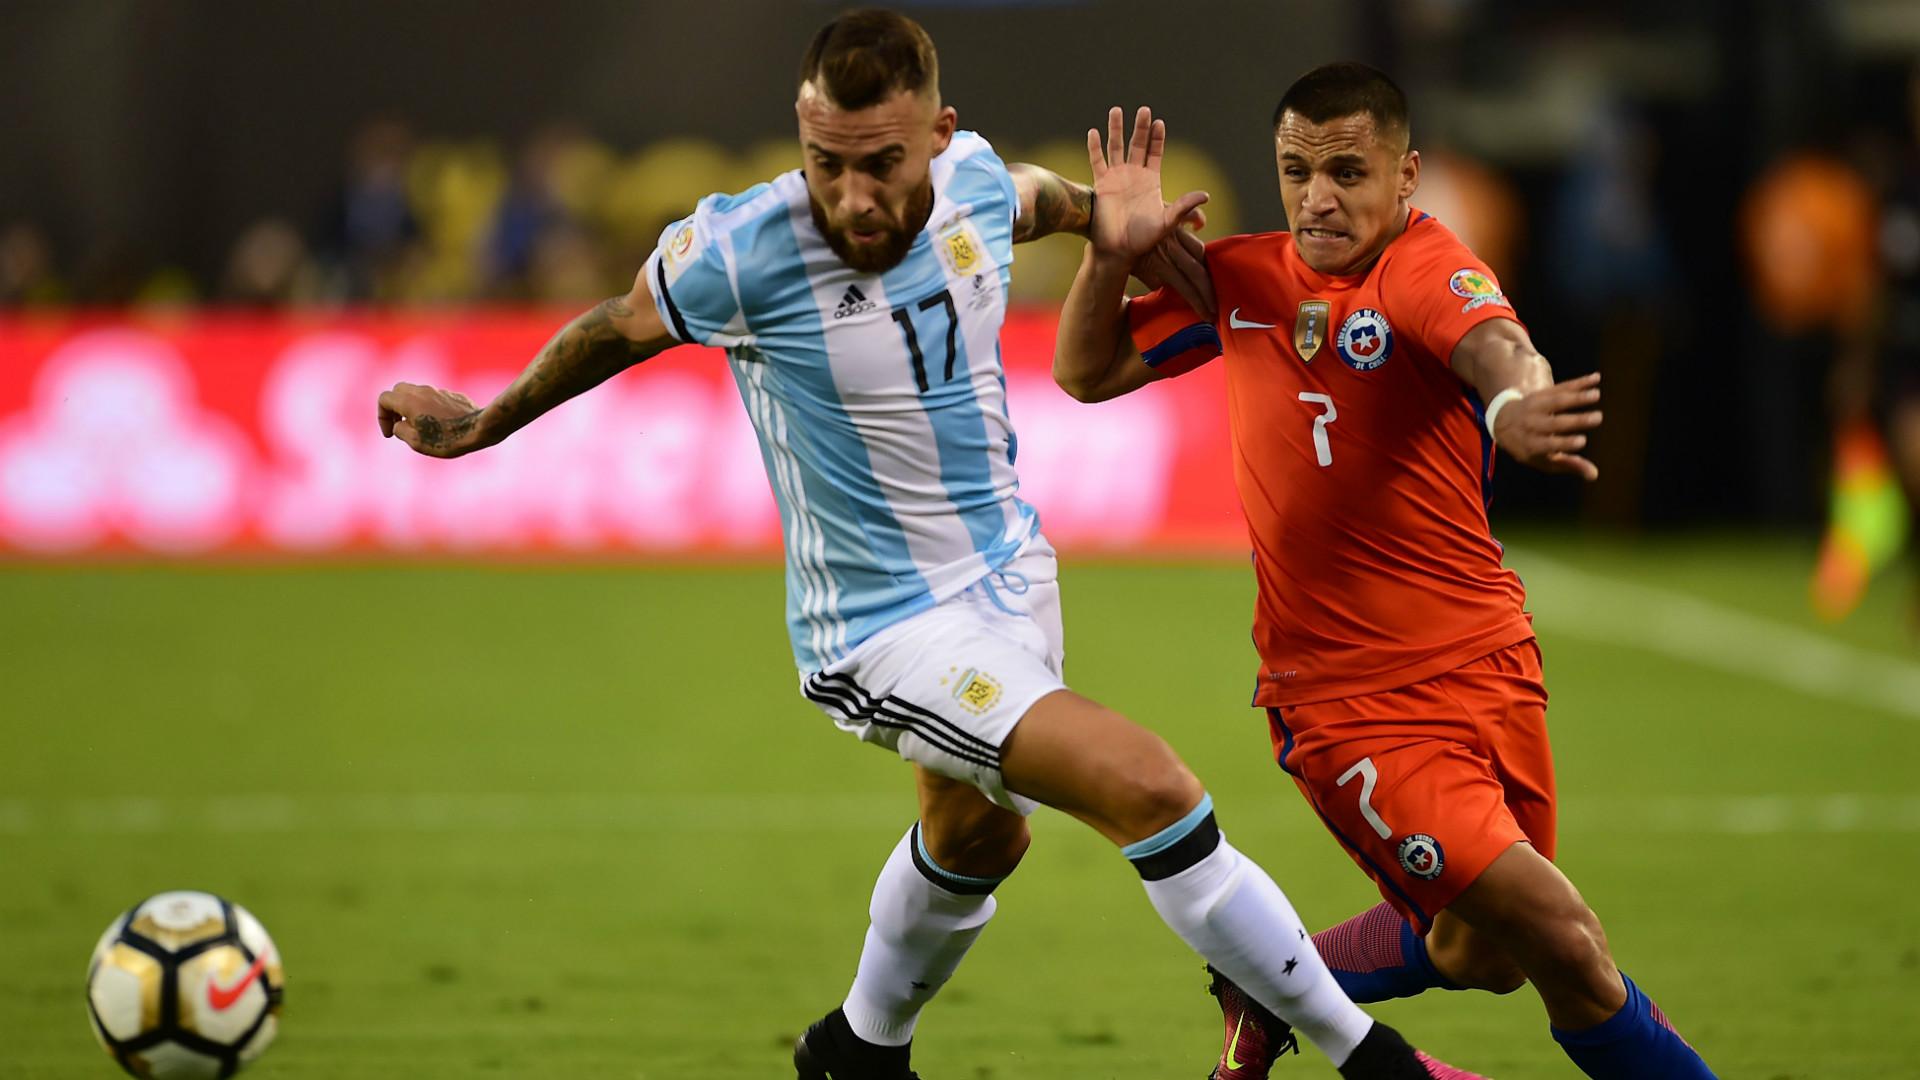 Nicolas Otamendi Alexis Sanchez Argentina Chile Final Copa America Centenario 26062016